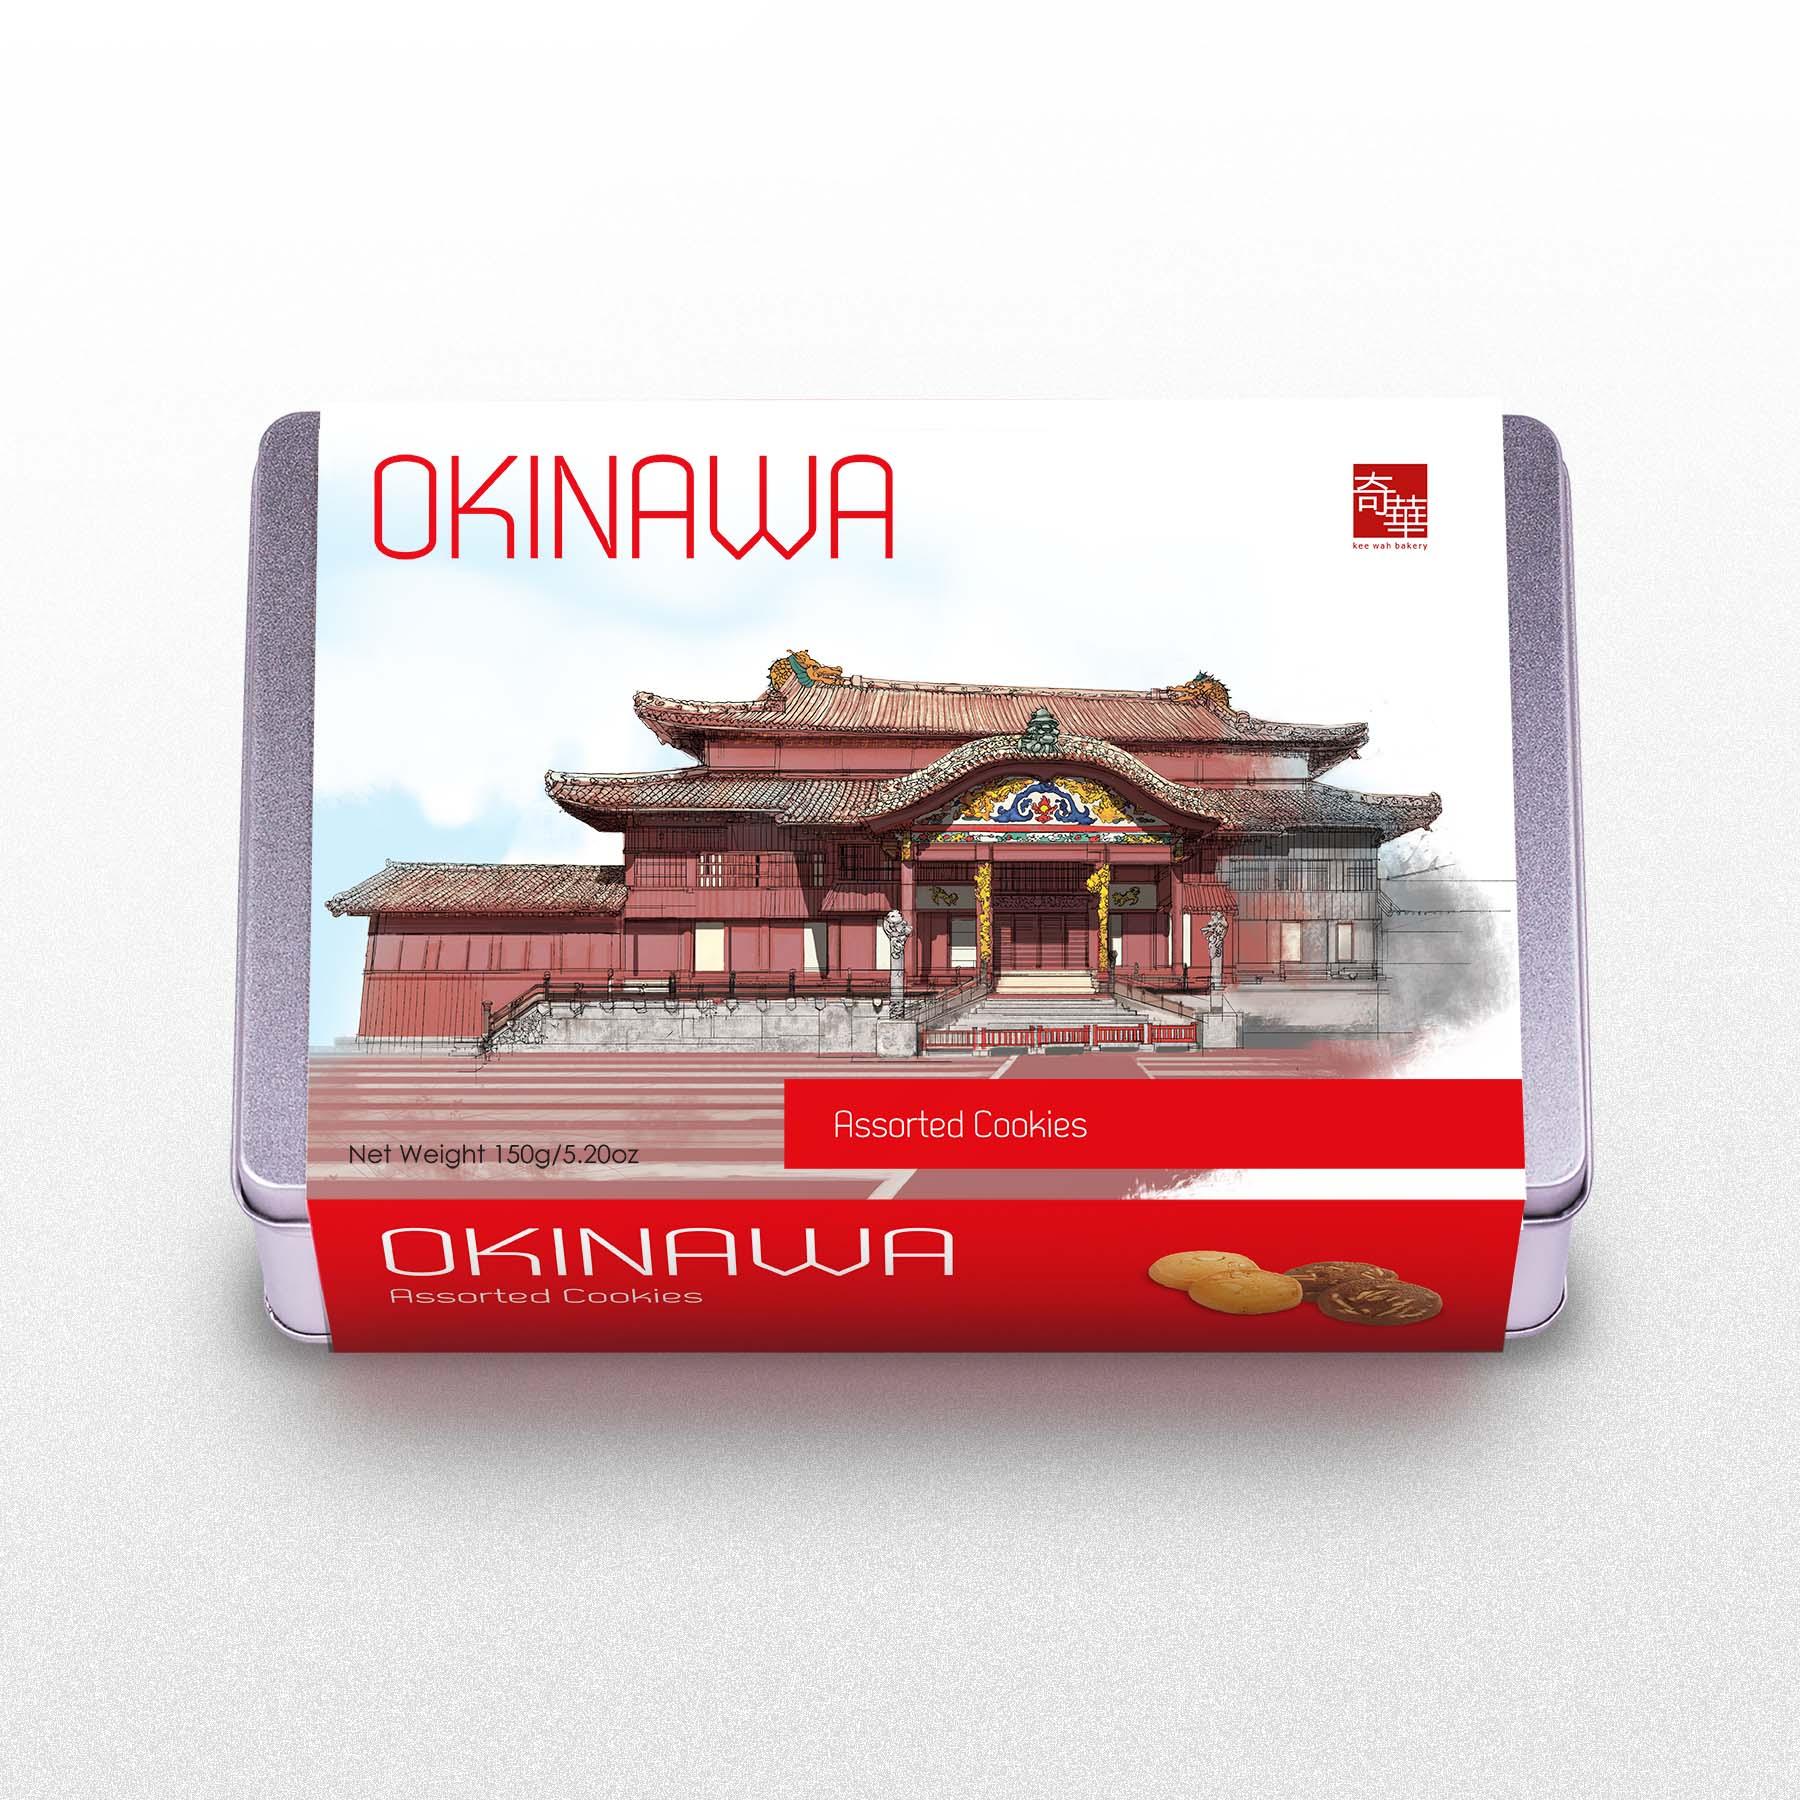 Okinawa Travel Cookie Box for DFS